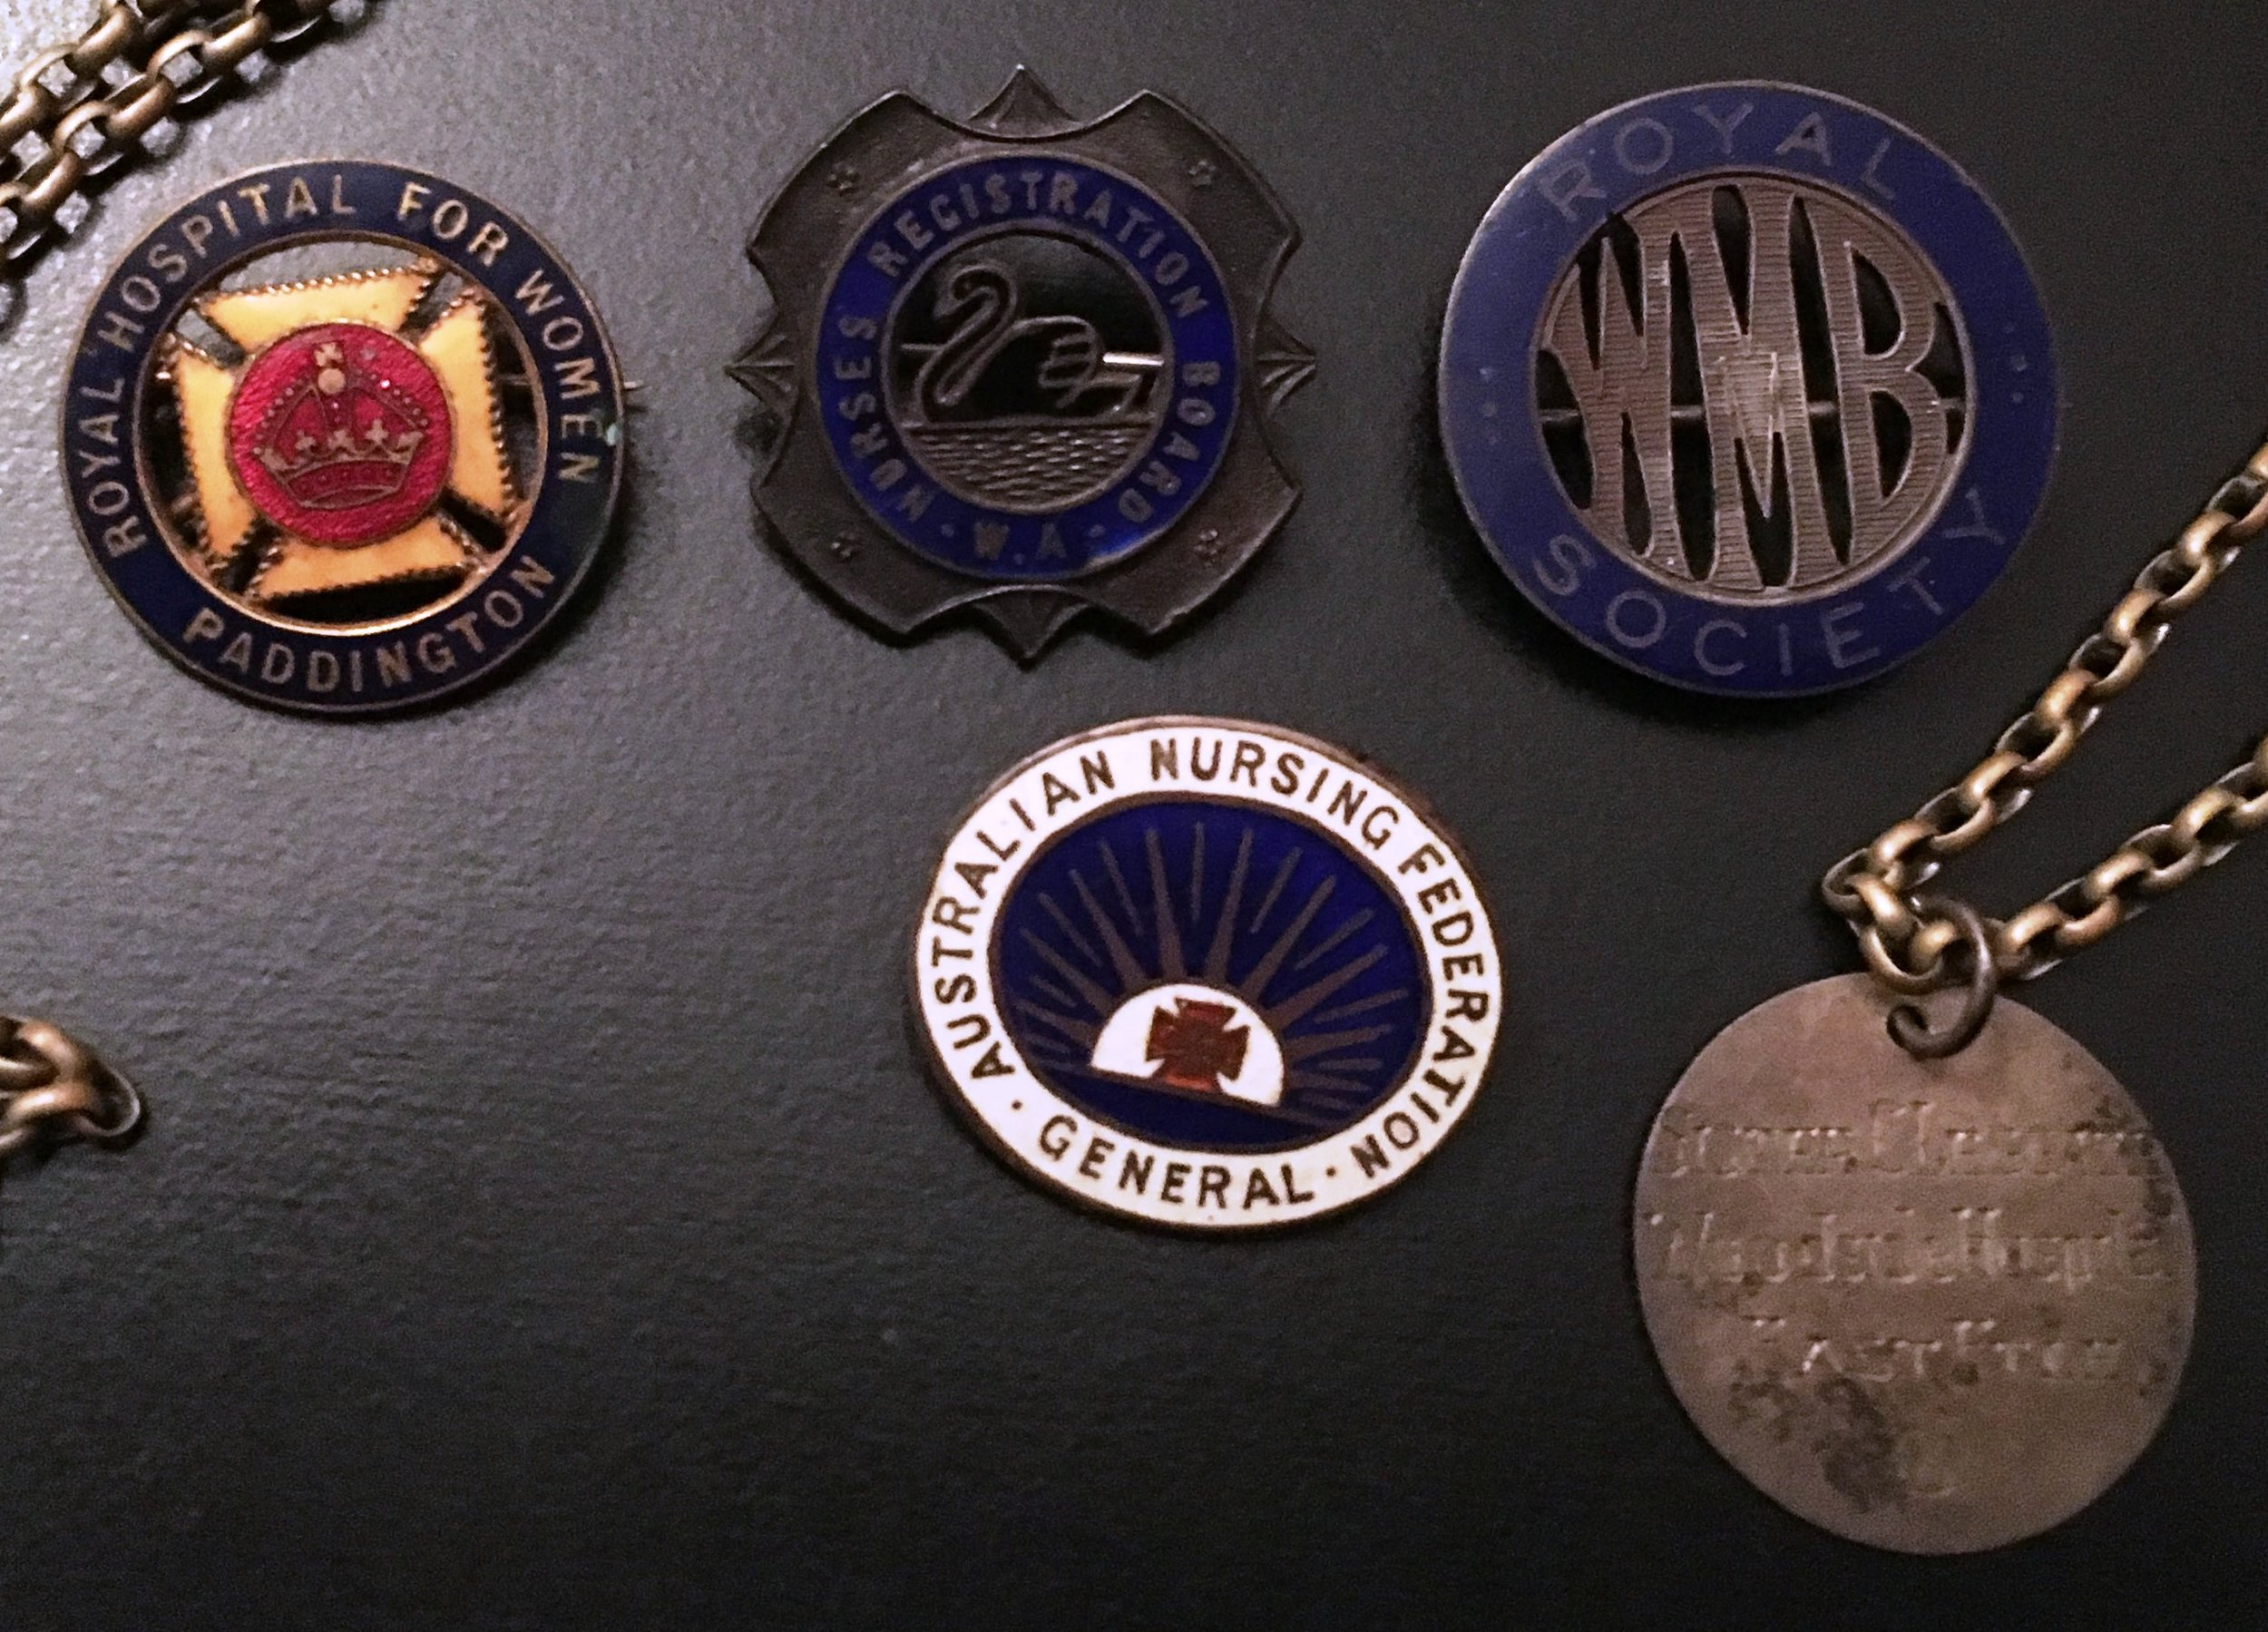 Matron Leggate medals